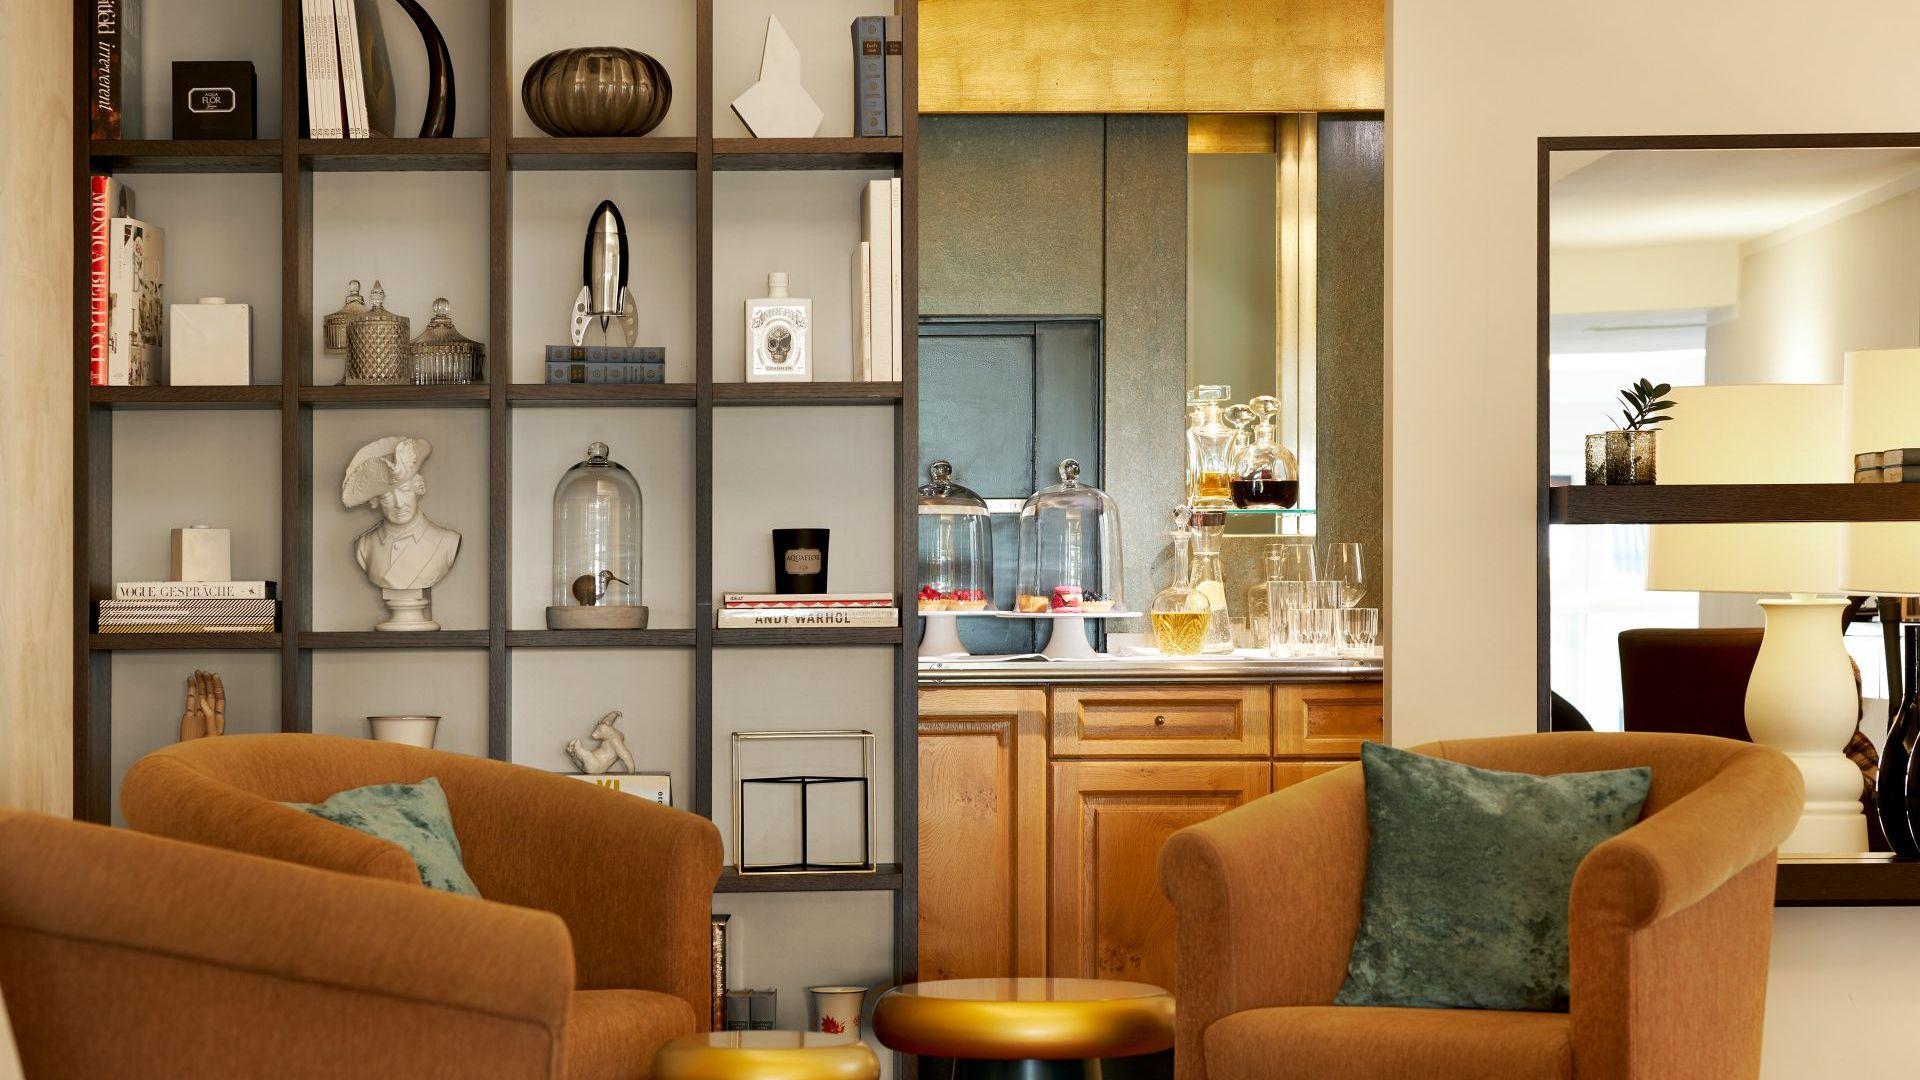 Classik-Hotel-Collection-Hackescher-Markt-Lobby-Shelf-Afternoon